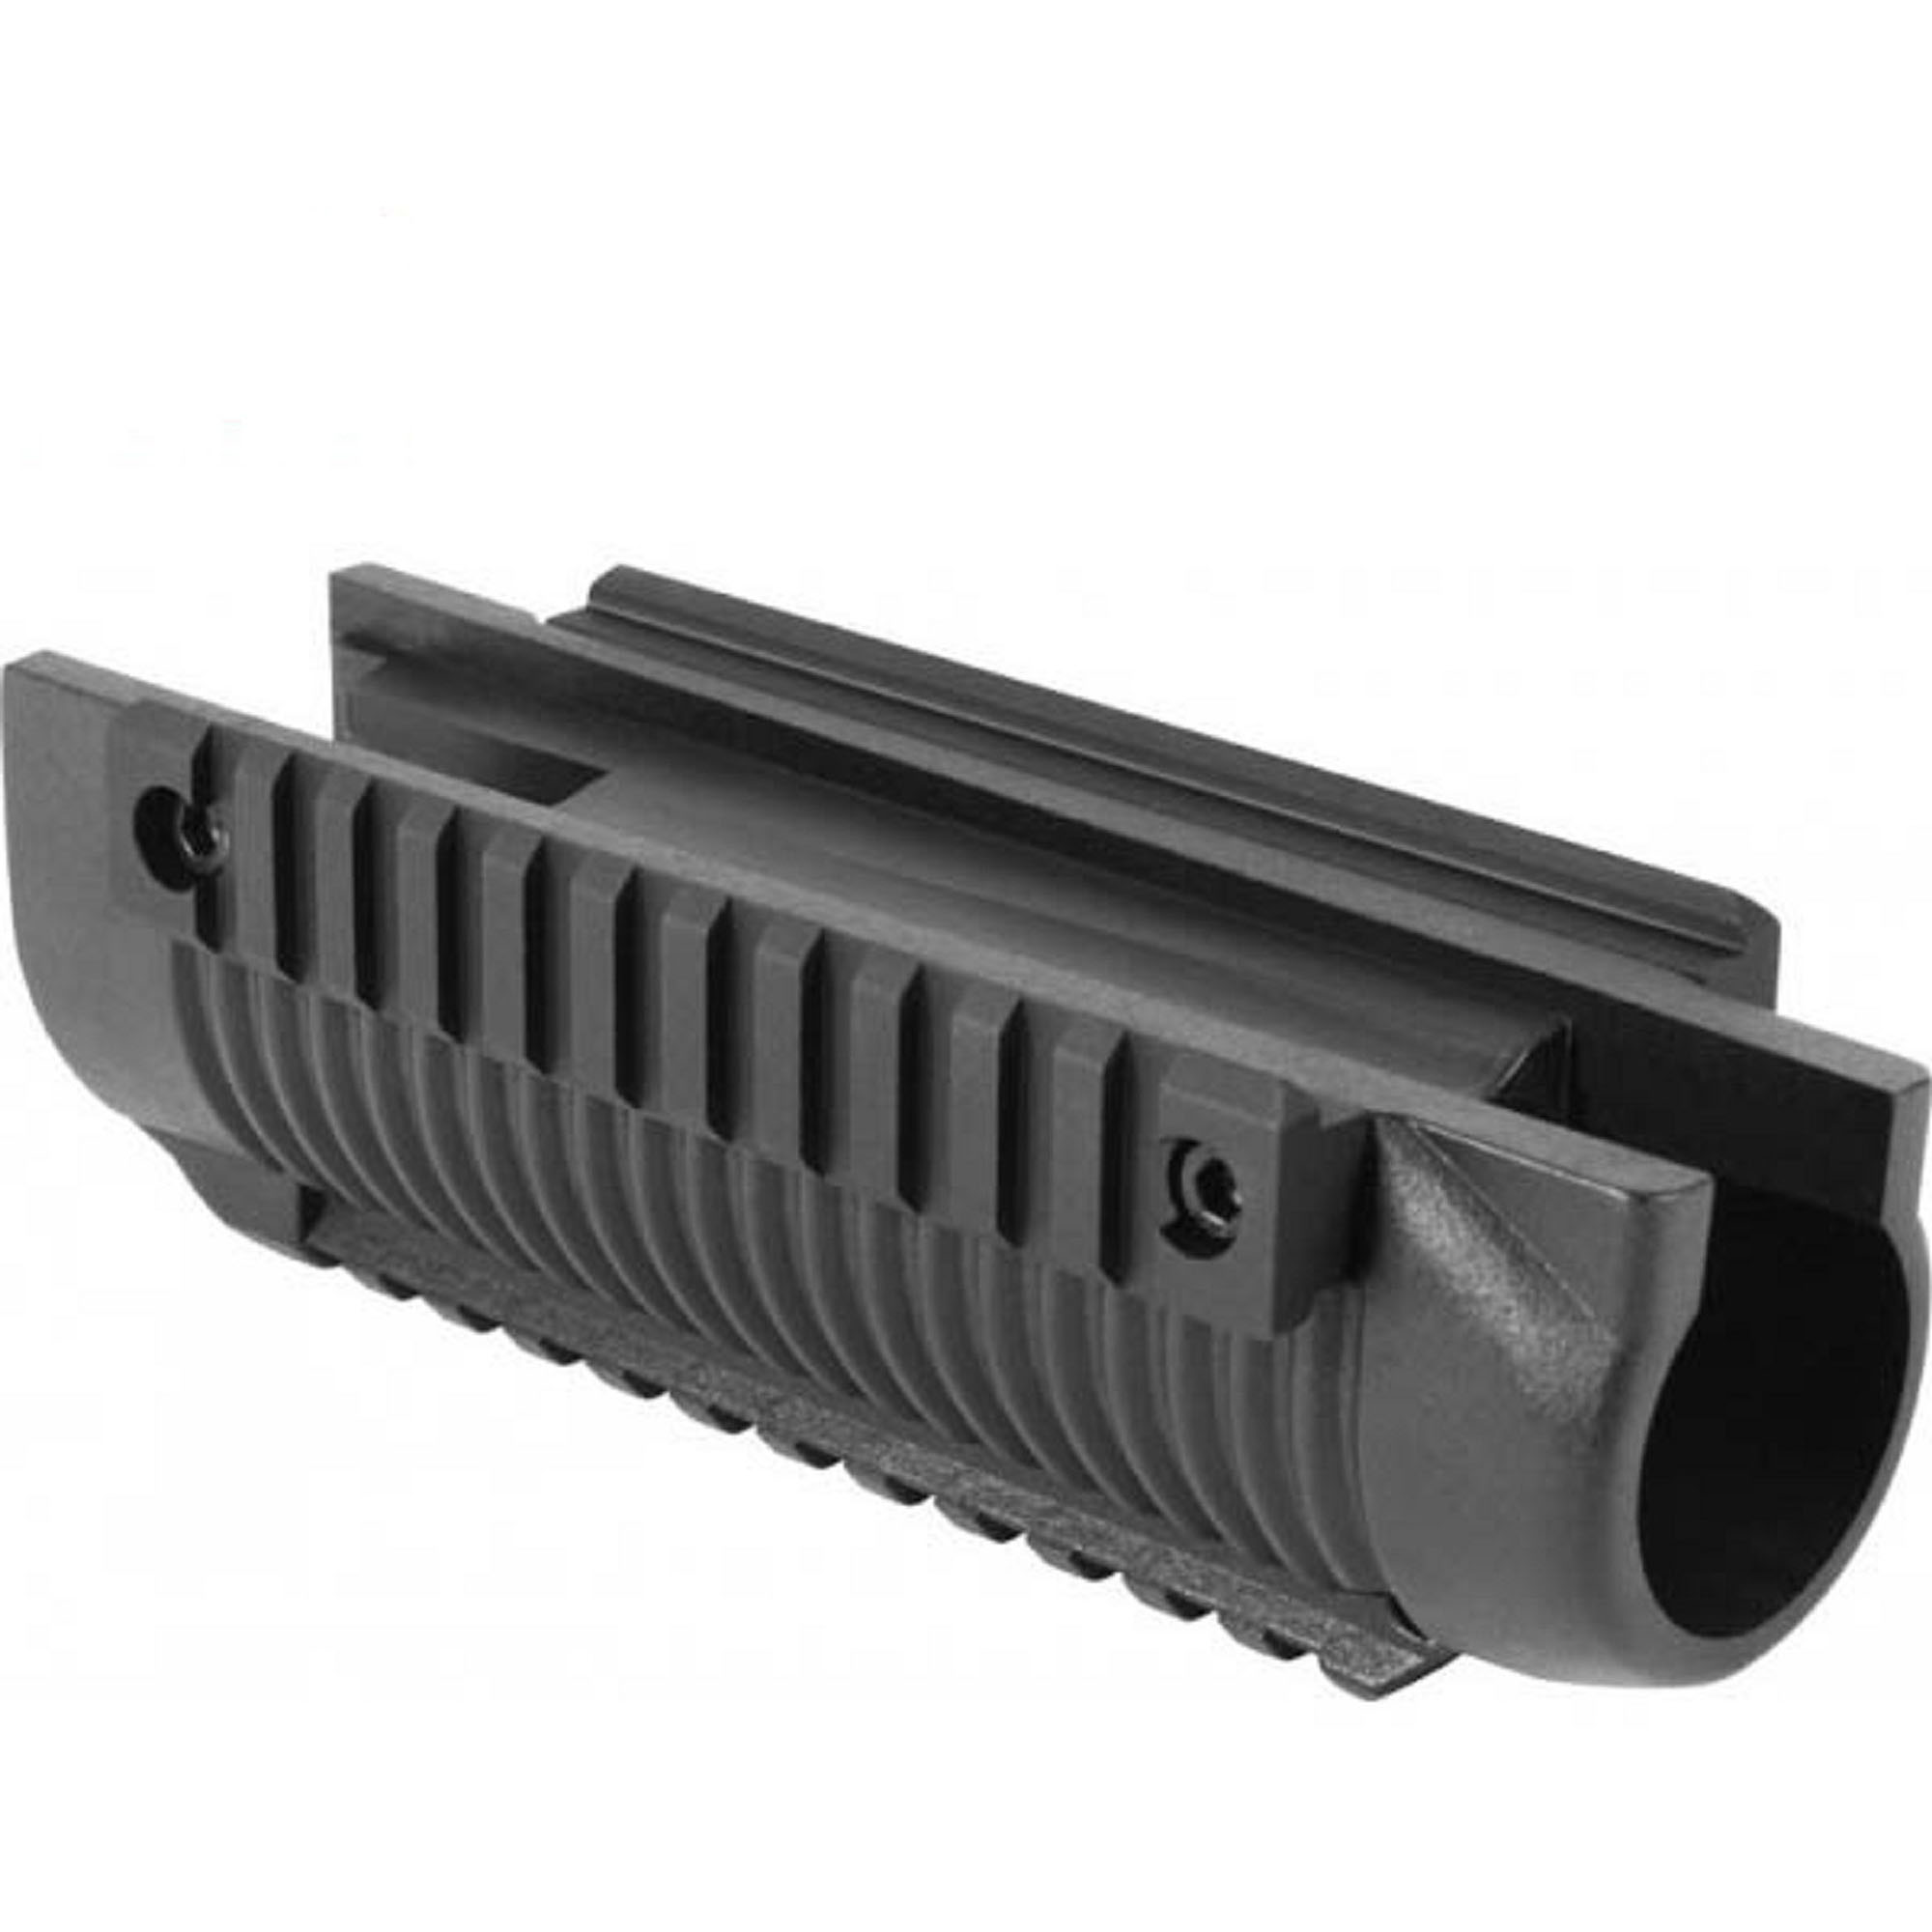 AIM Sports Remington 870 Shotgun Forend